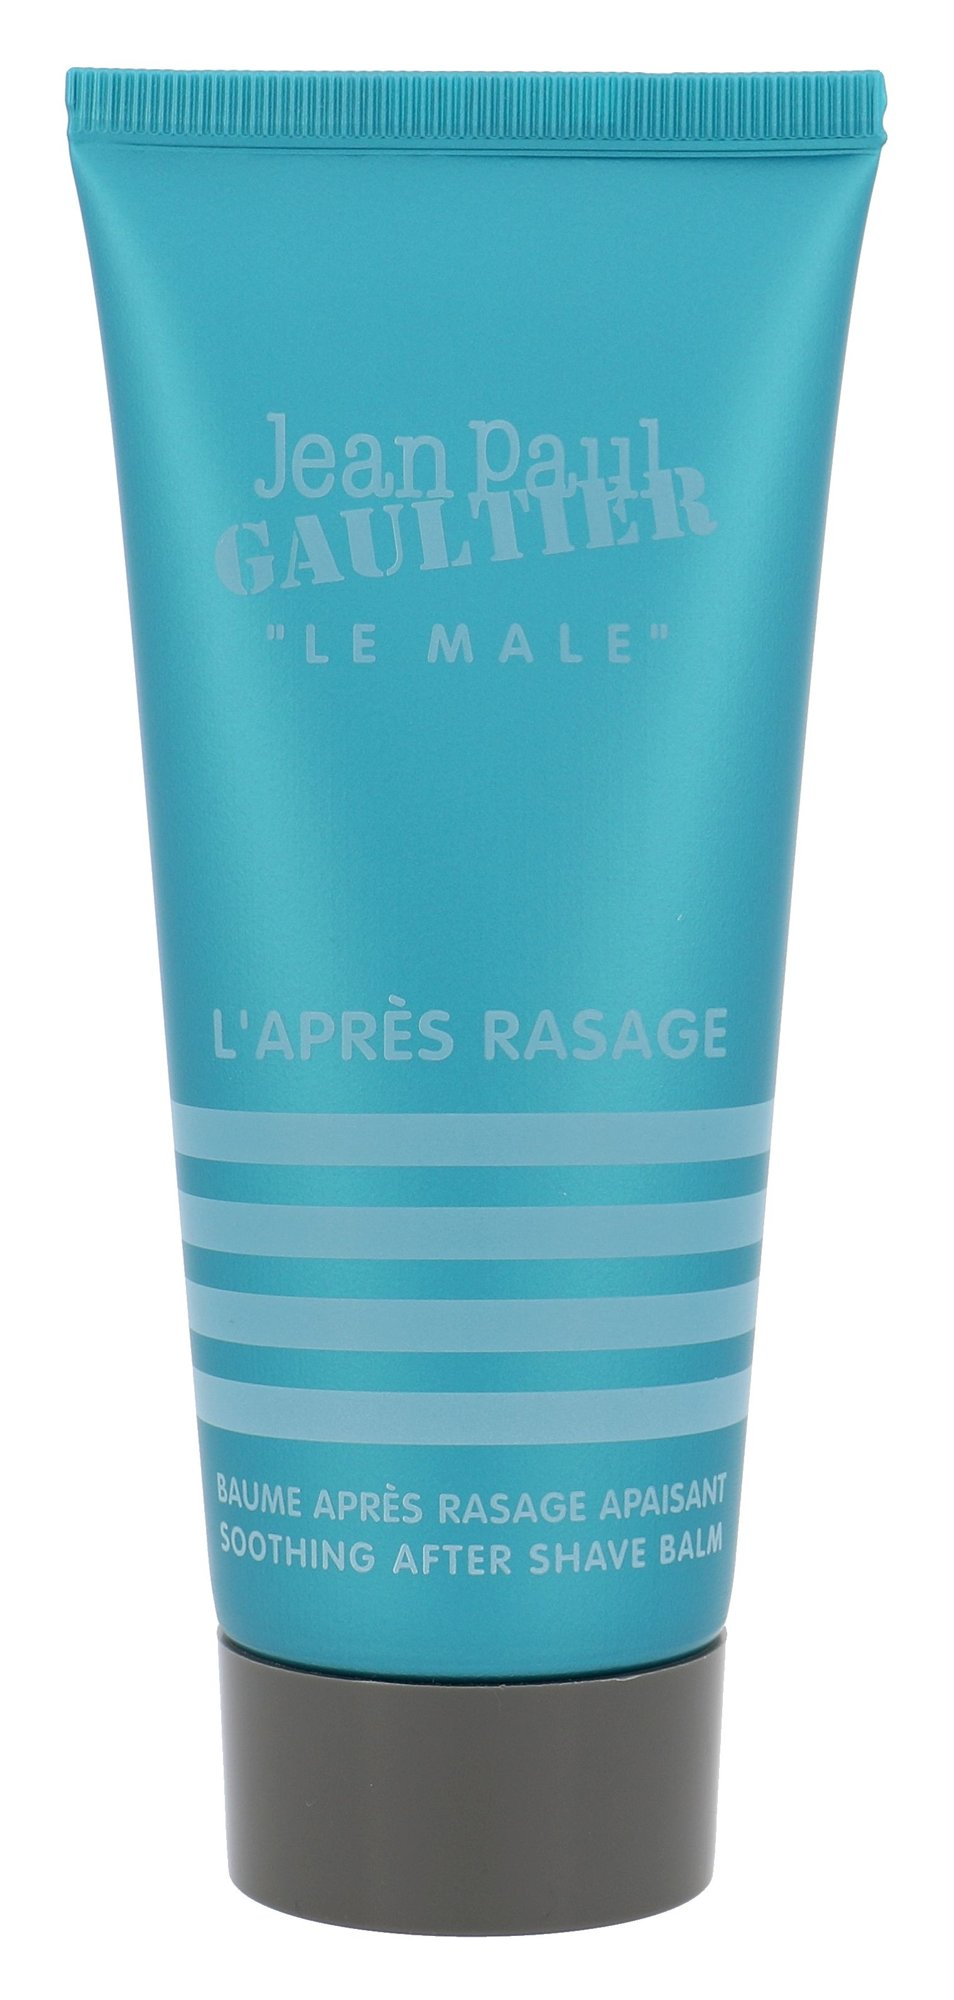 Jean Paul Gaultier Le Male After shave balm 100ml